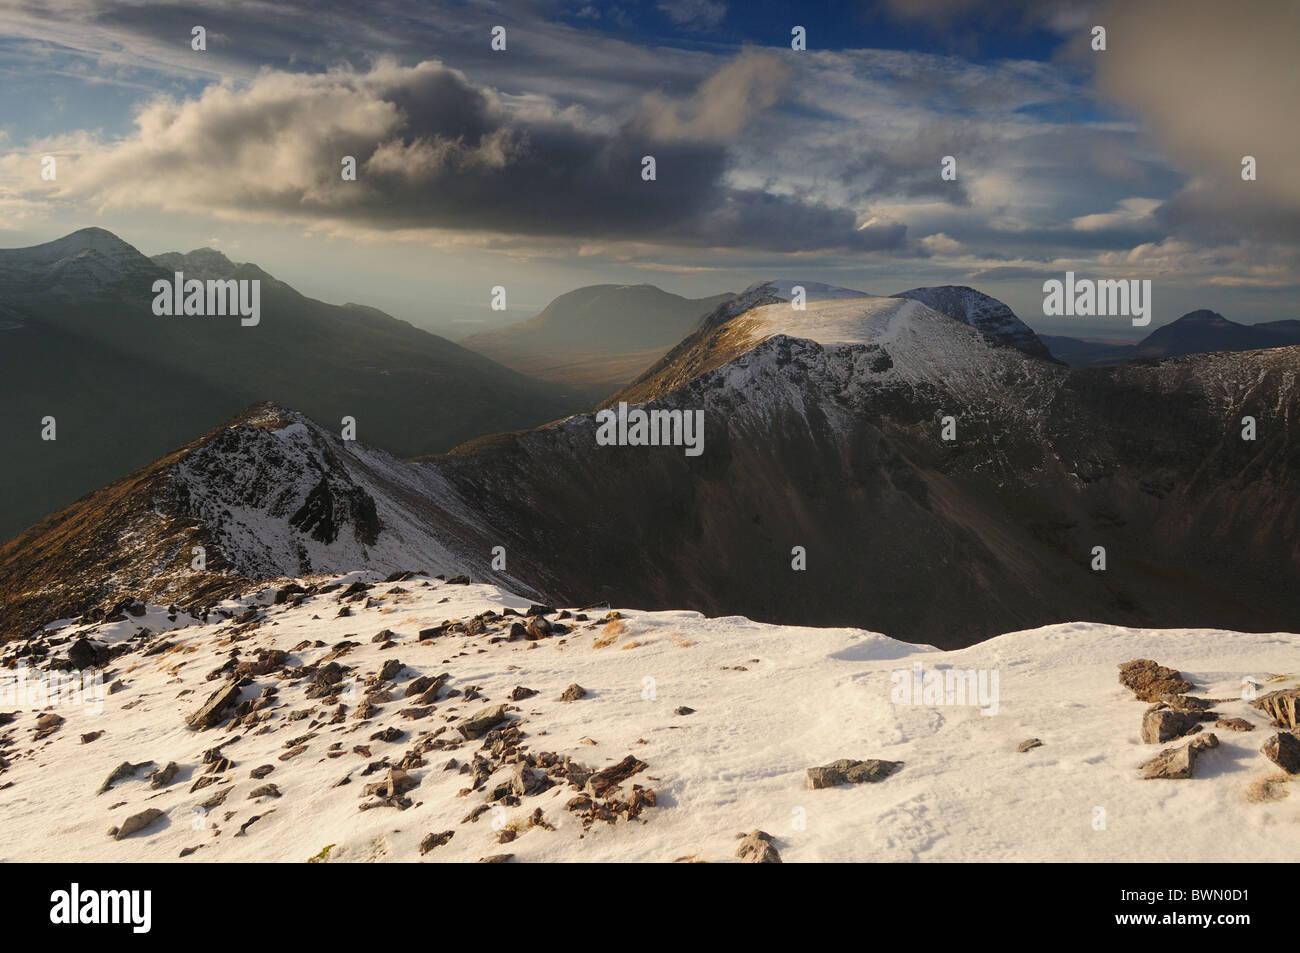 View along Beinn Eighe summit ridge towards Coinneach Mhor and Liathach, Torridon, Wester Ross, Scottish Highlands - Stock Image